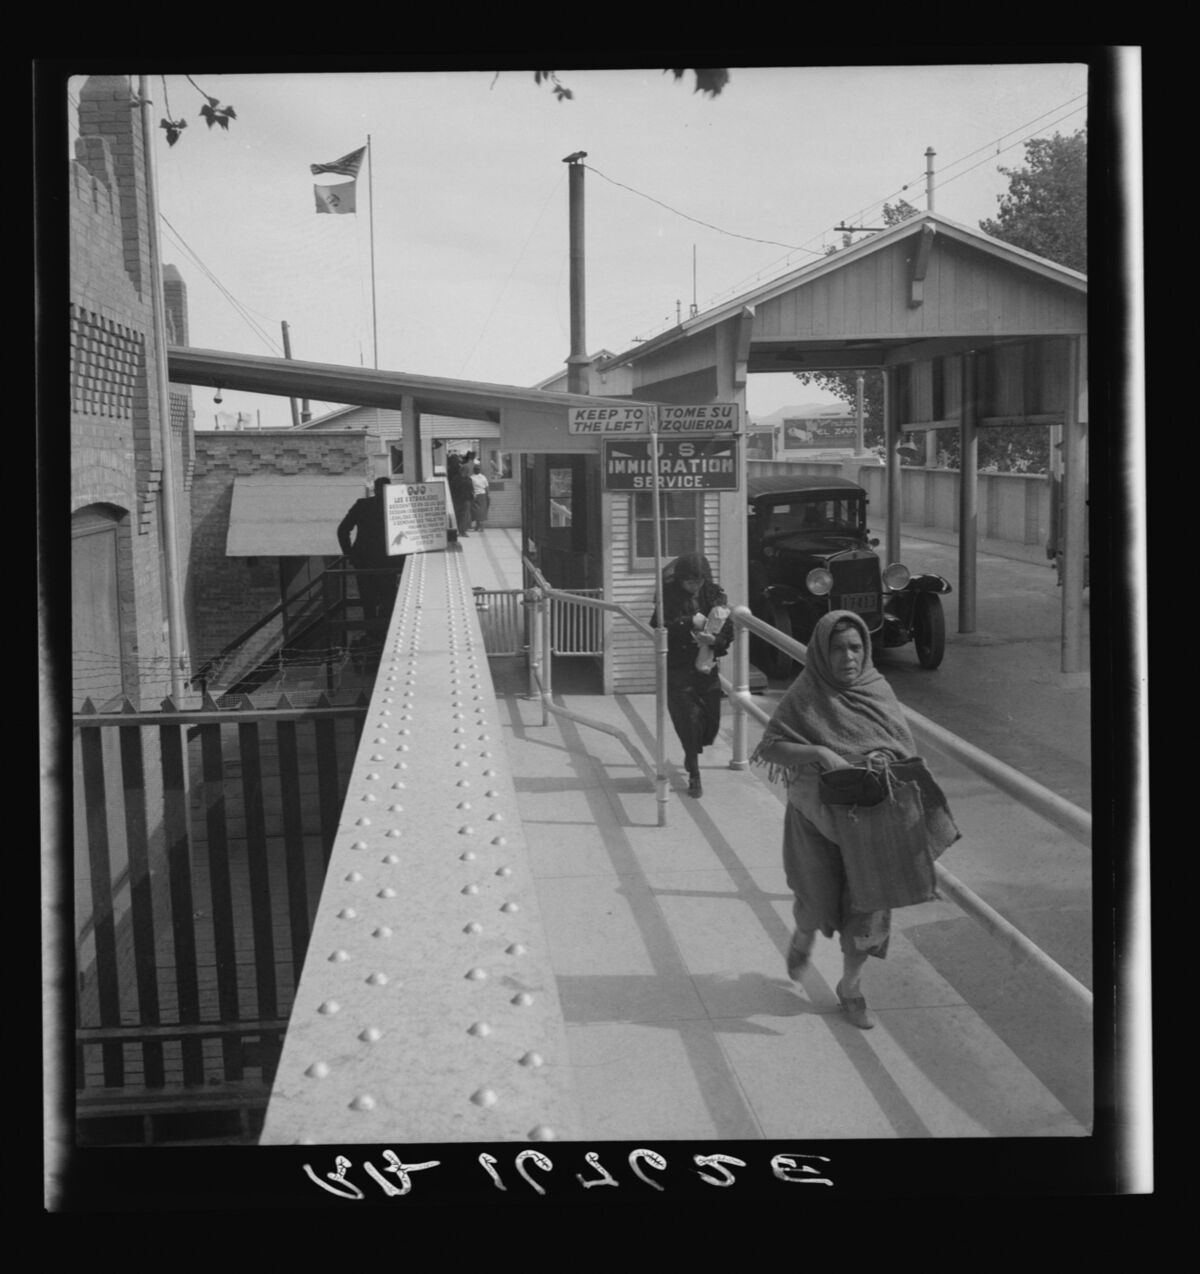 Dorothea Lange, Crossing the international bridge between Juarez, Mexico and El Paso, Texas 1937. Courtesy of the Library of Congress.